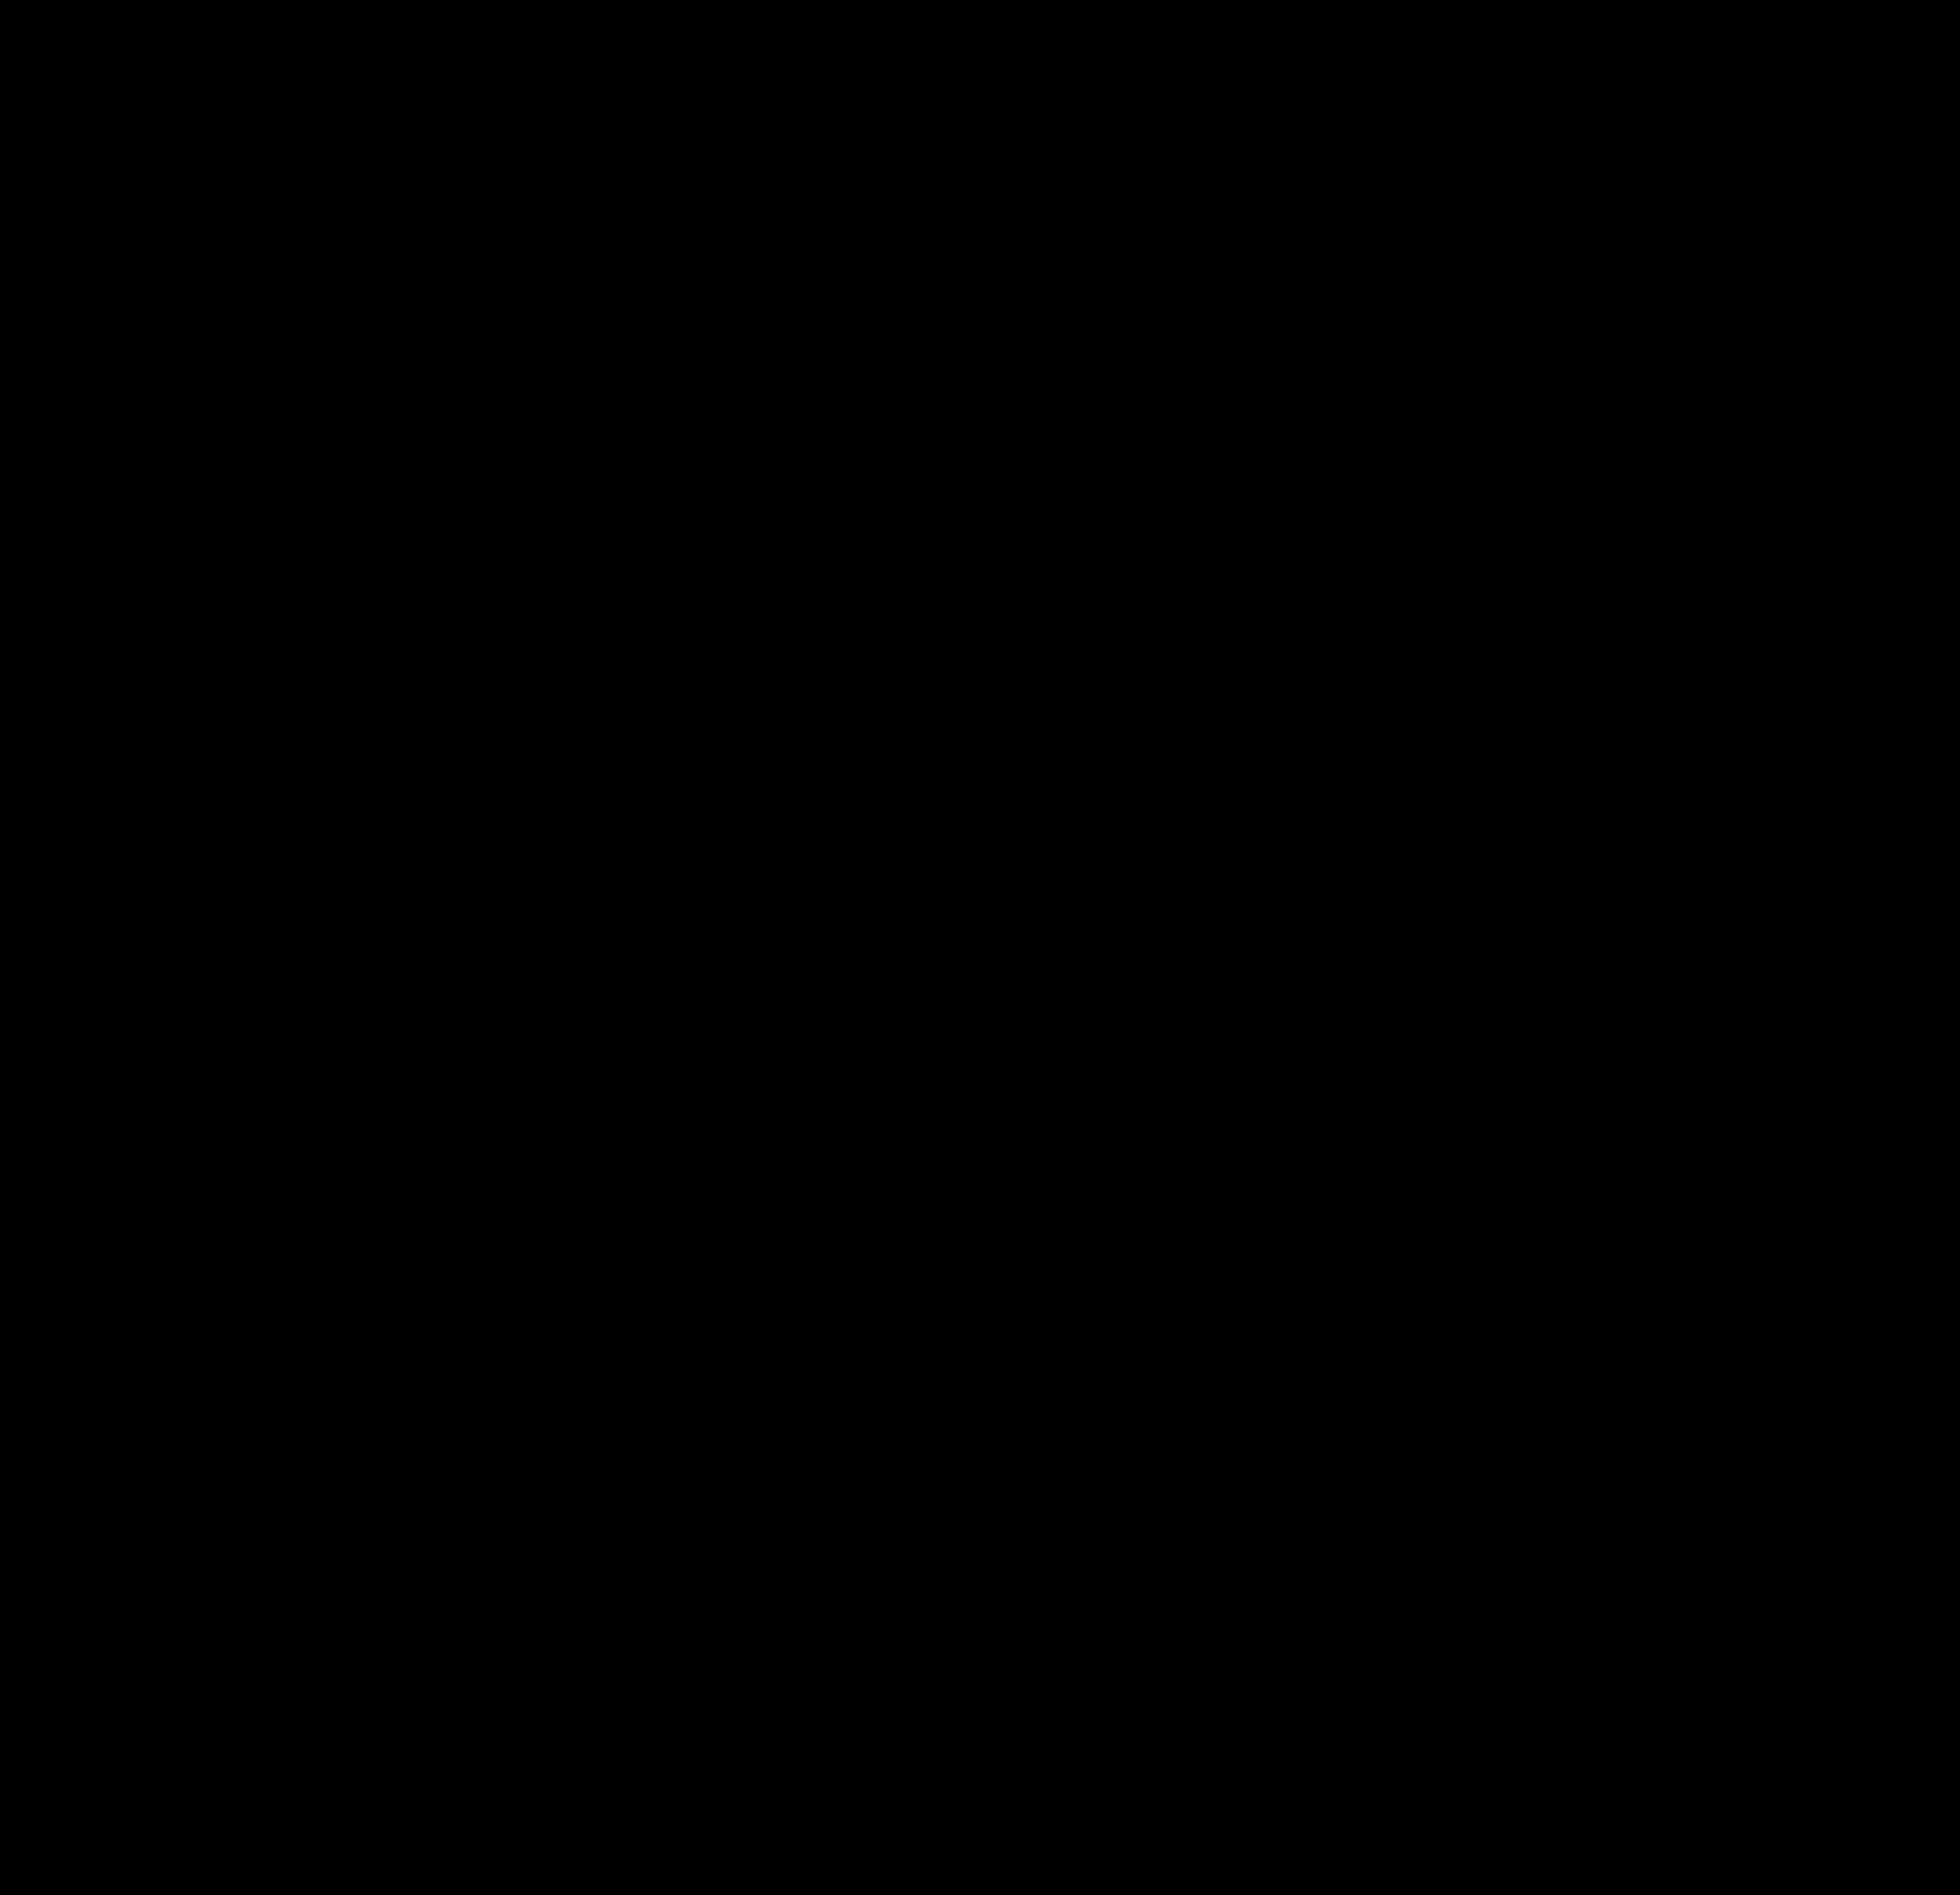 70MM-logo (1).png